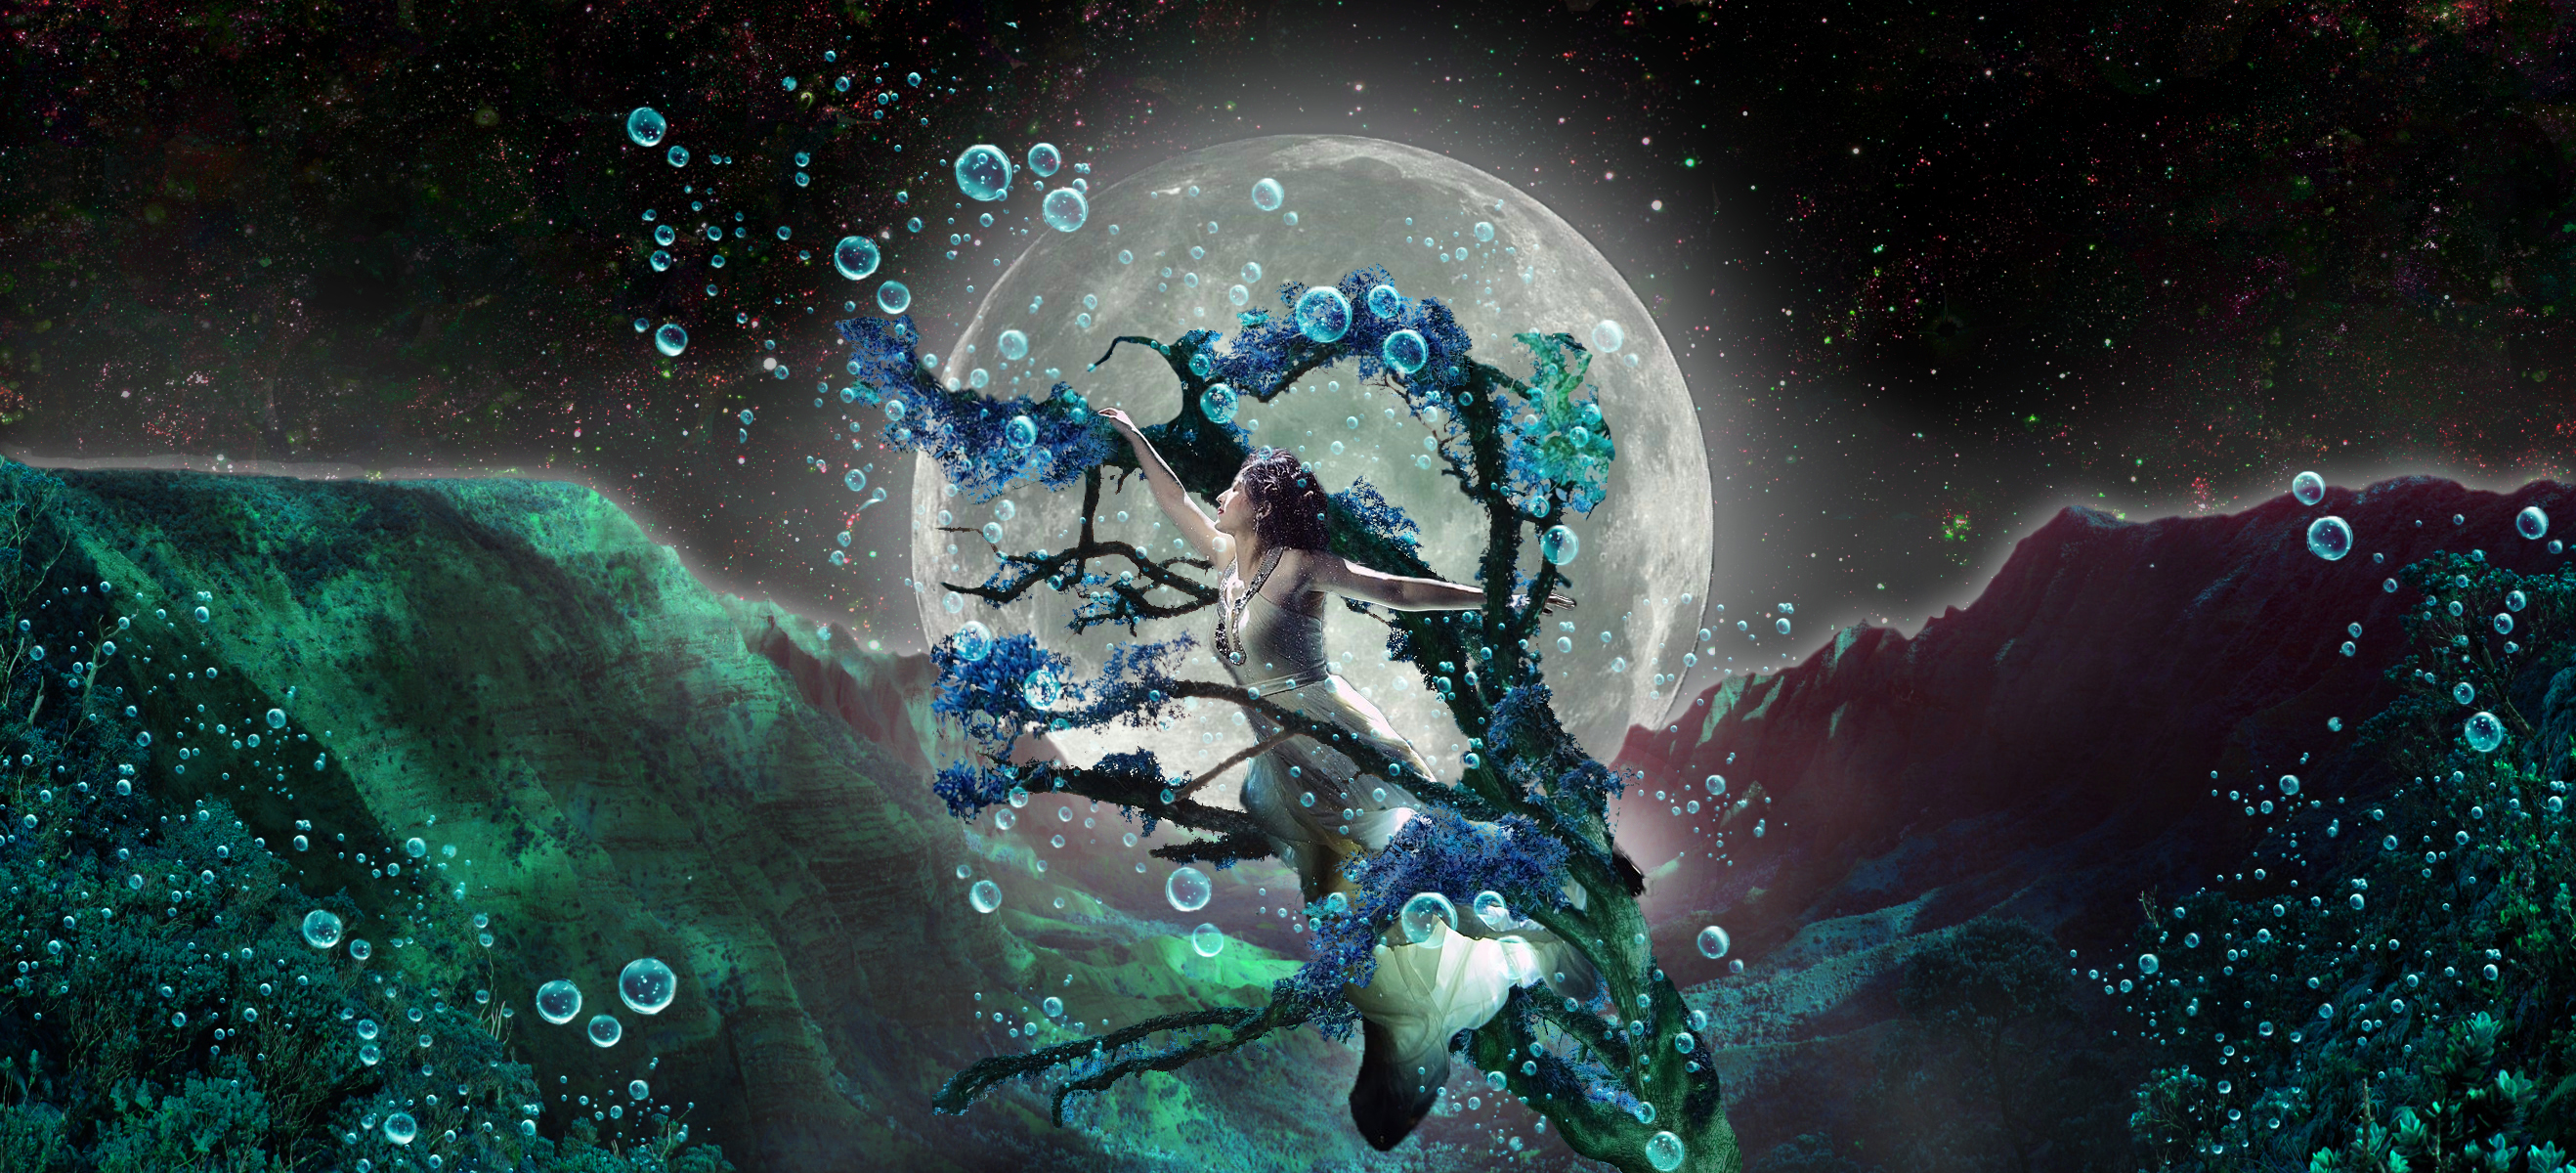 Fantasy Project Sage